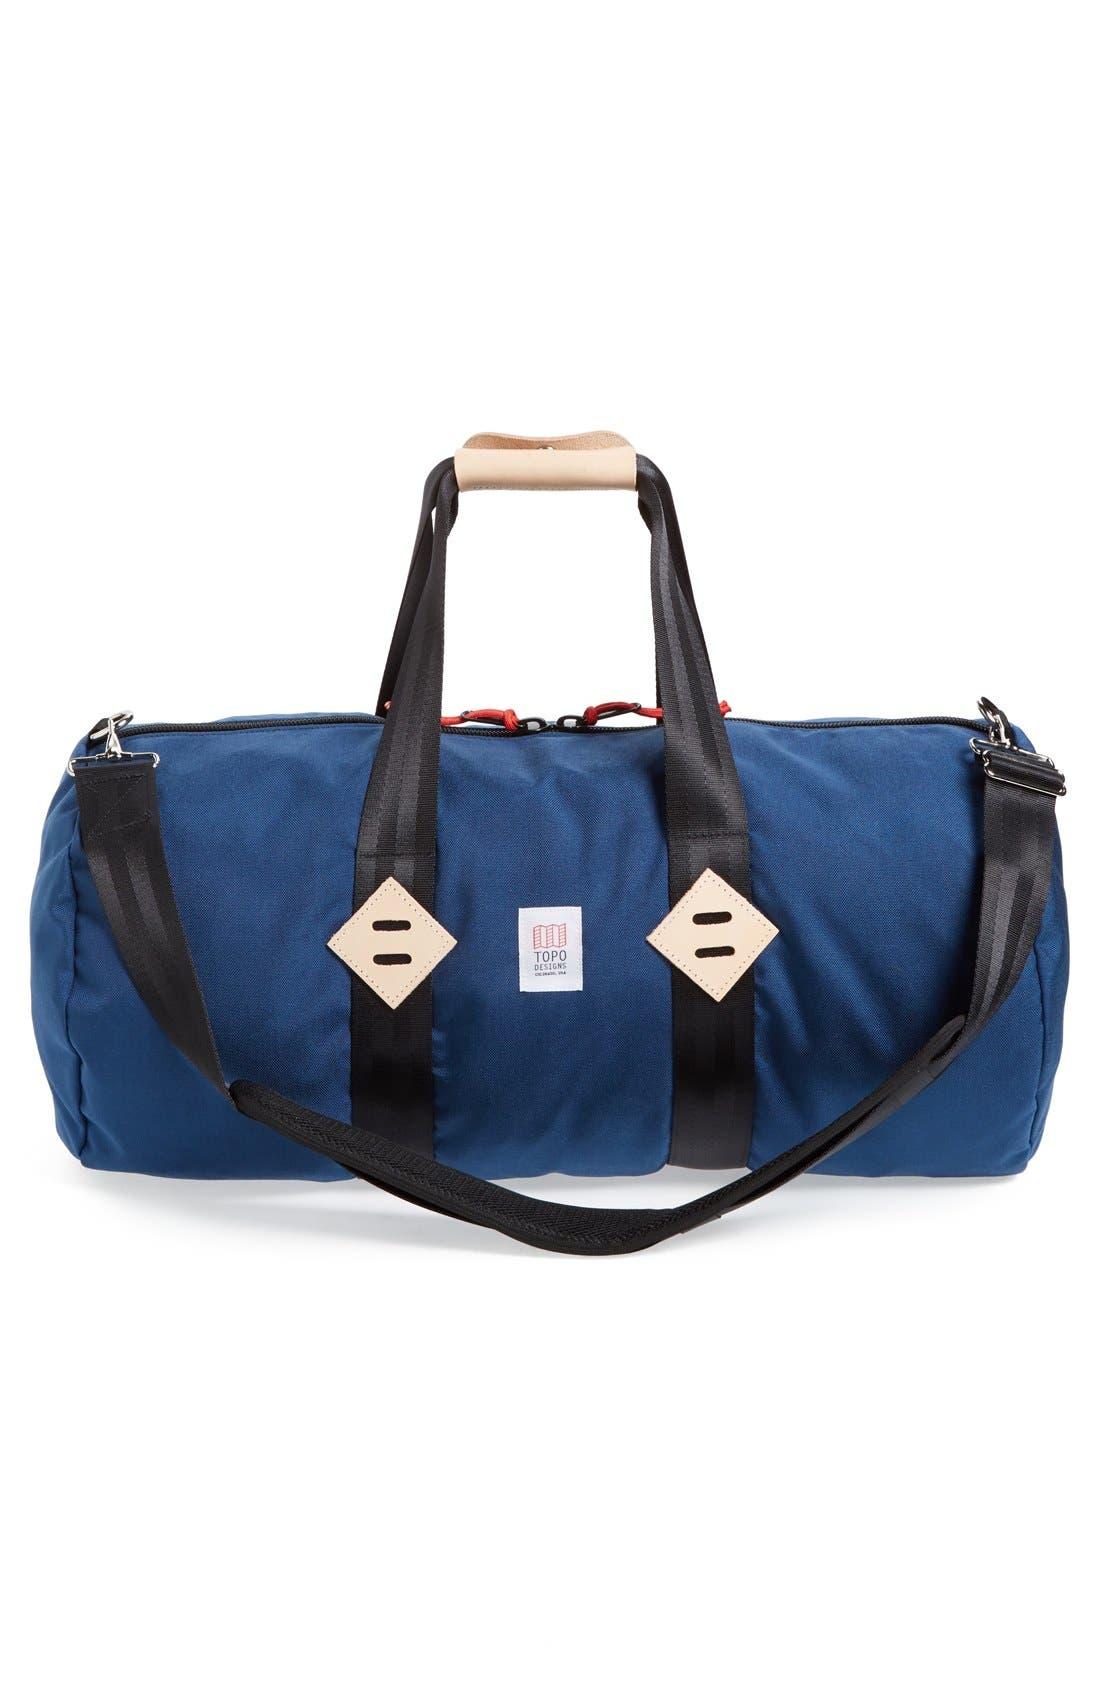 Alternate Image 3  - Topo Designs Classic Duffel Bag